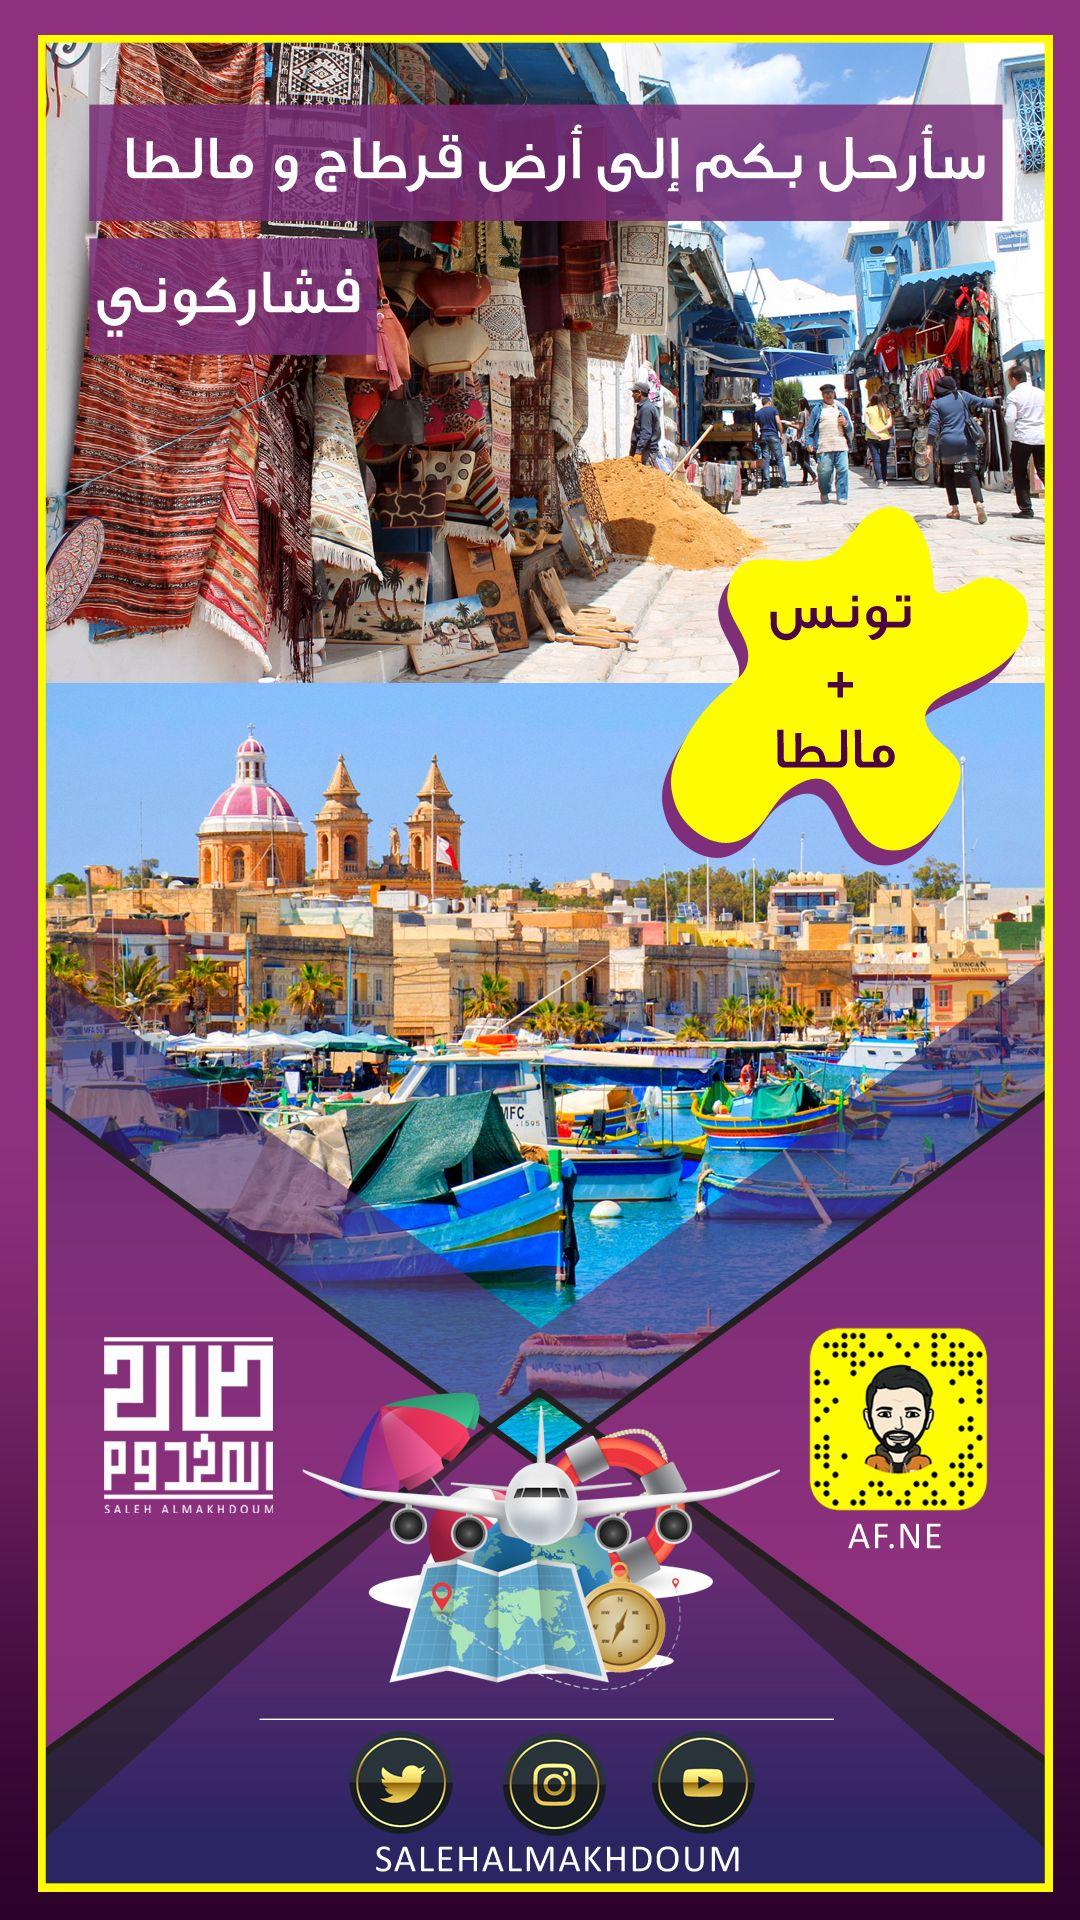 تونس Tunisia Comic Book Cover Comic Books Books